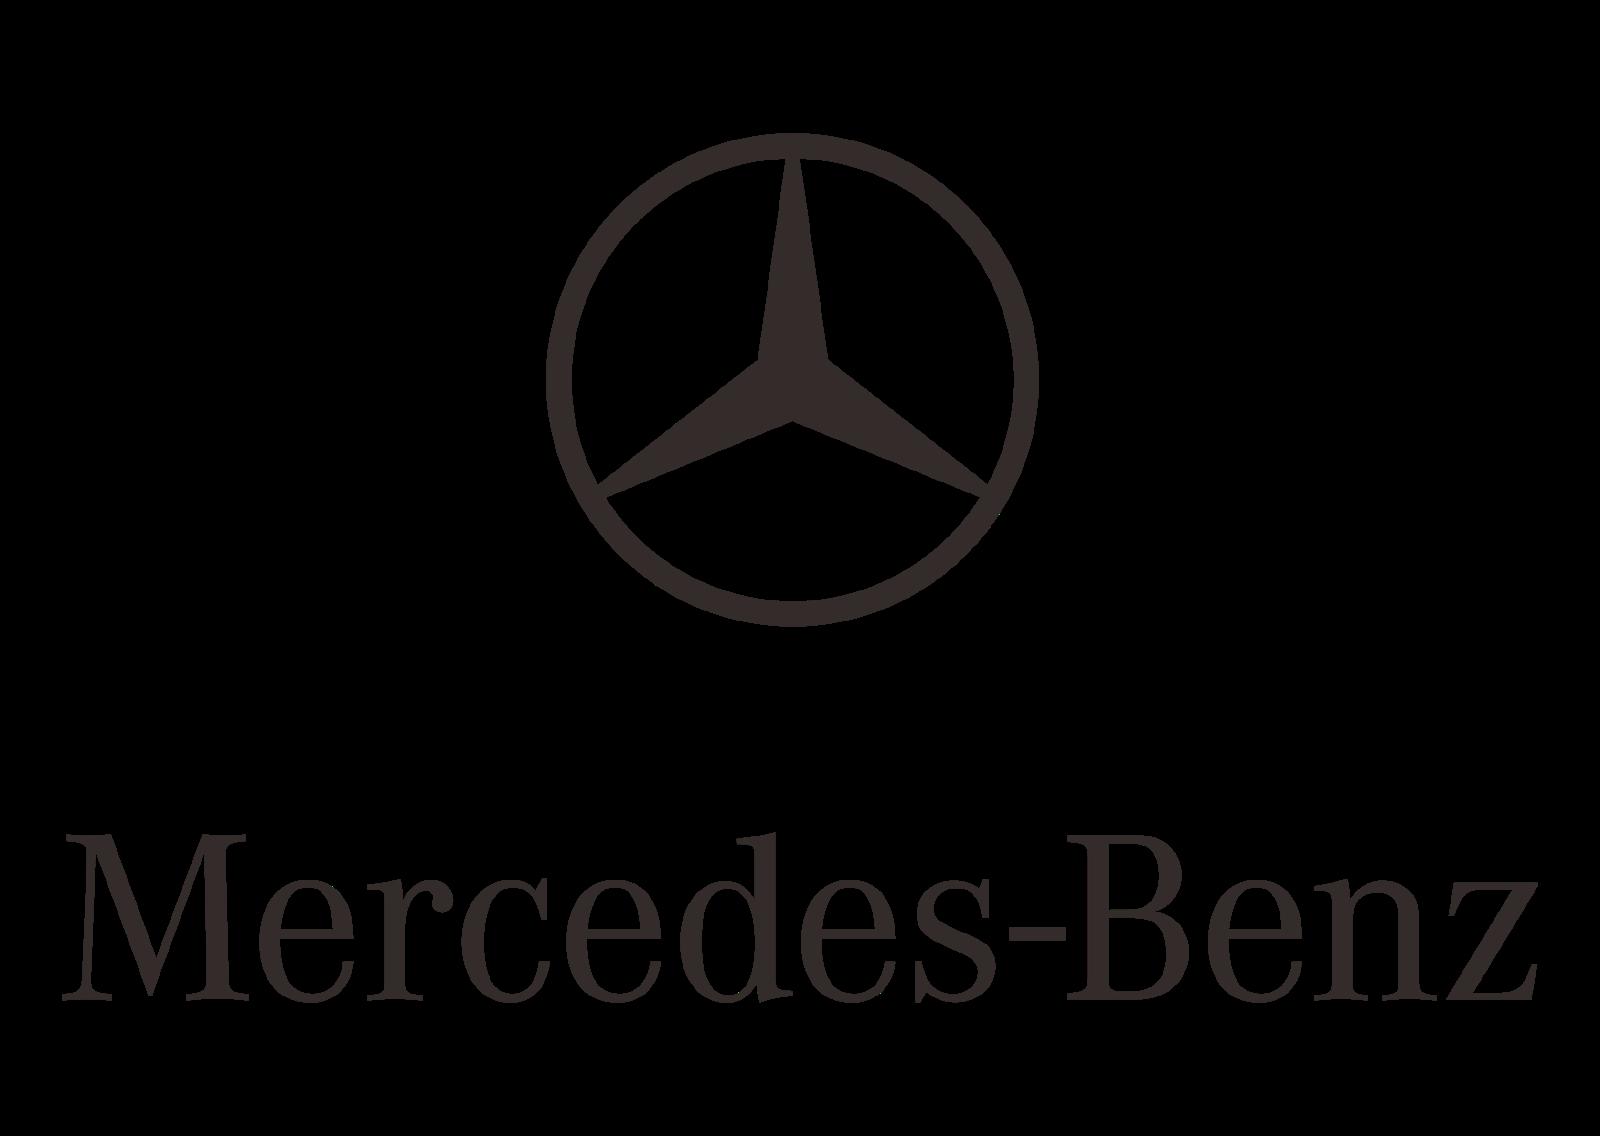 Download mercedes benz logo transparent image hq png image for Mercedes benz logo png